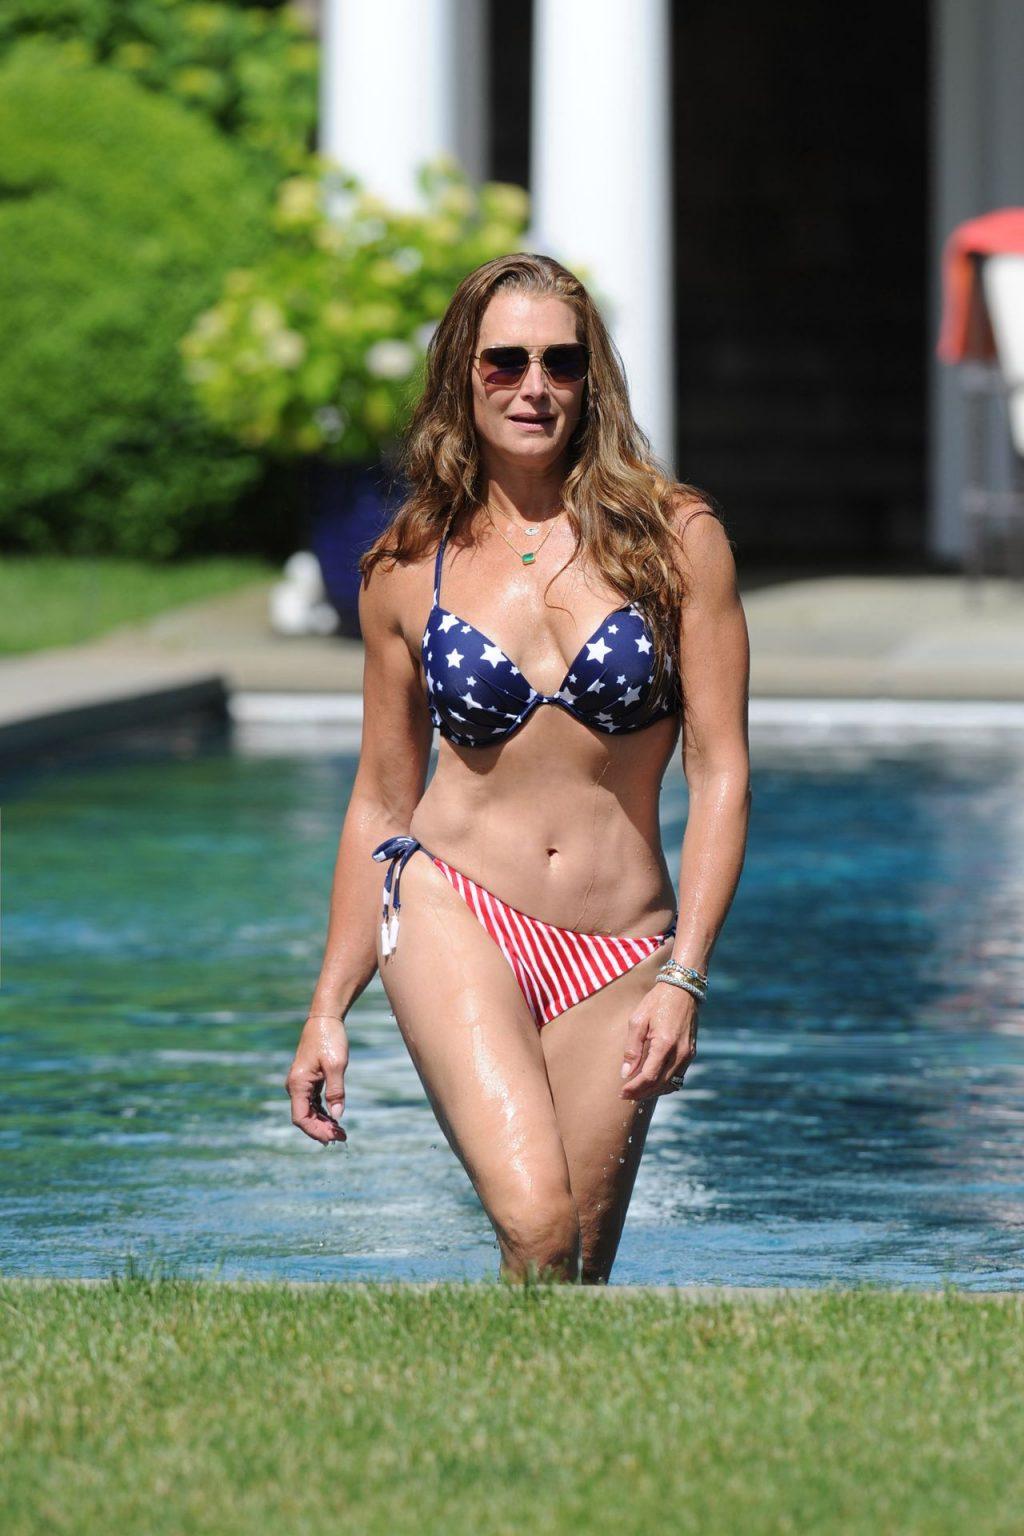 Brooke Shields Is Rocking a Bikini After Turning 55 (21 Photos)